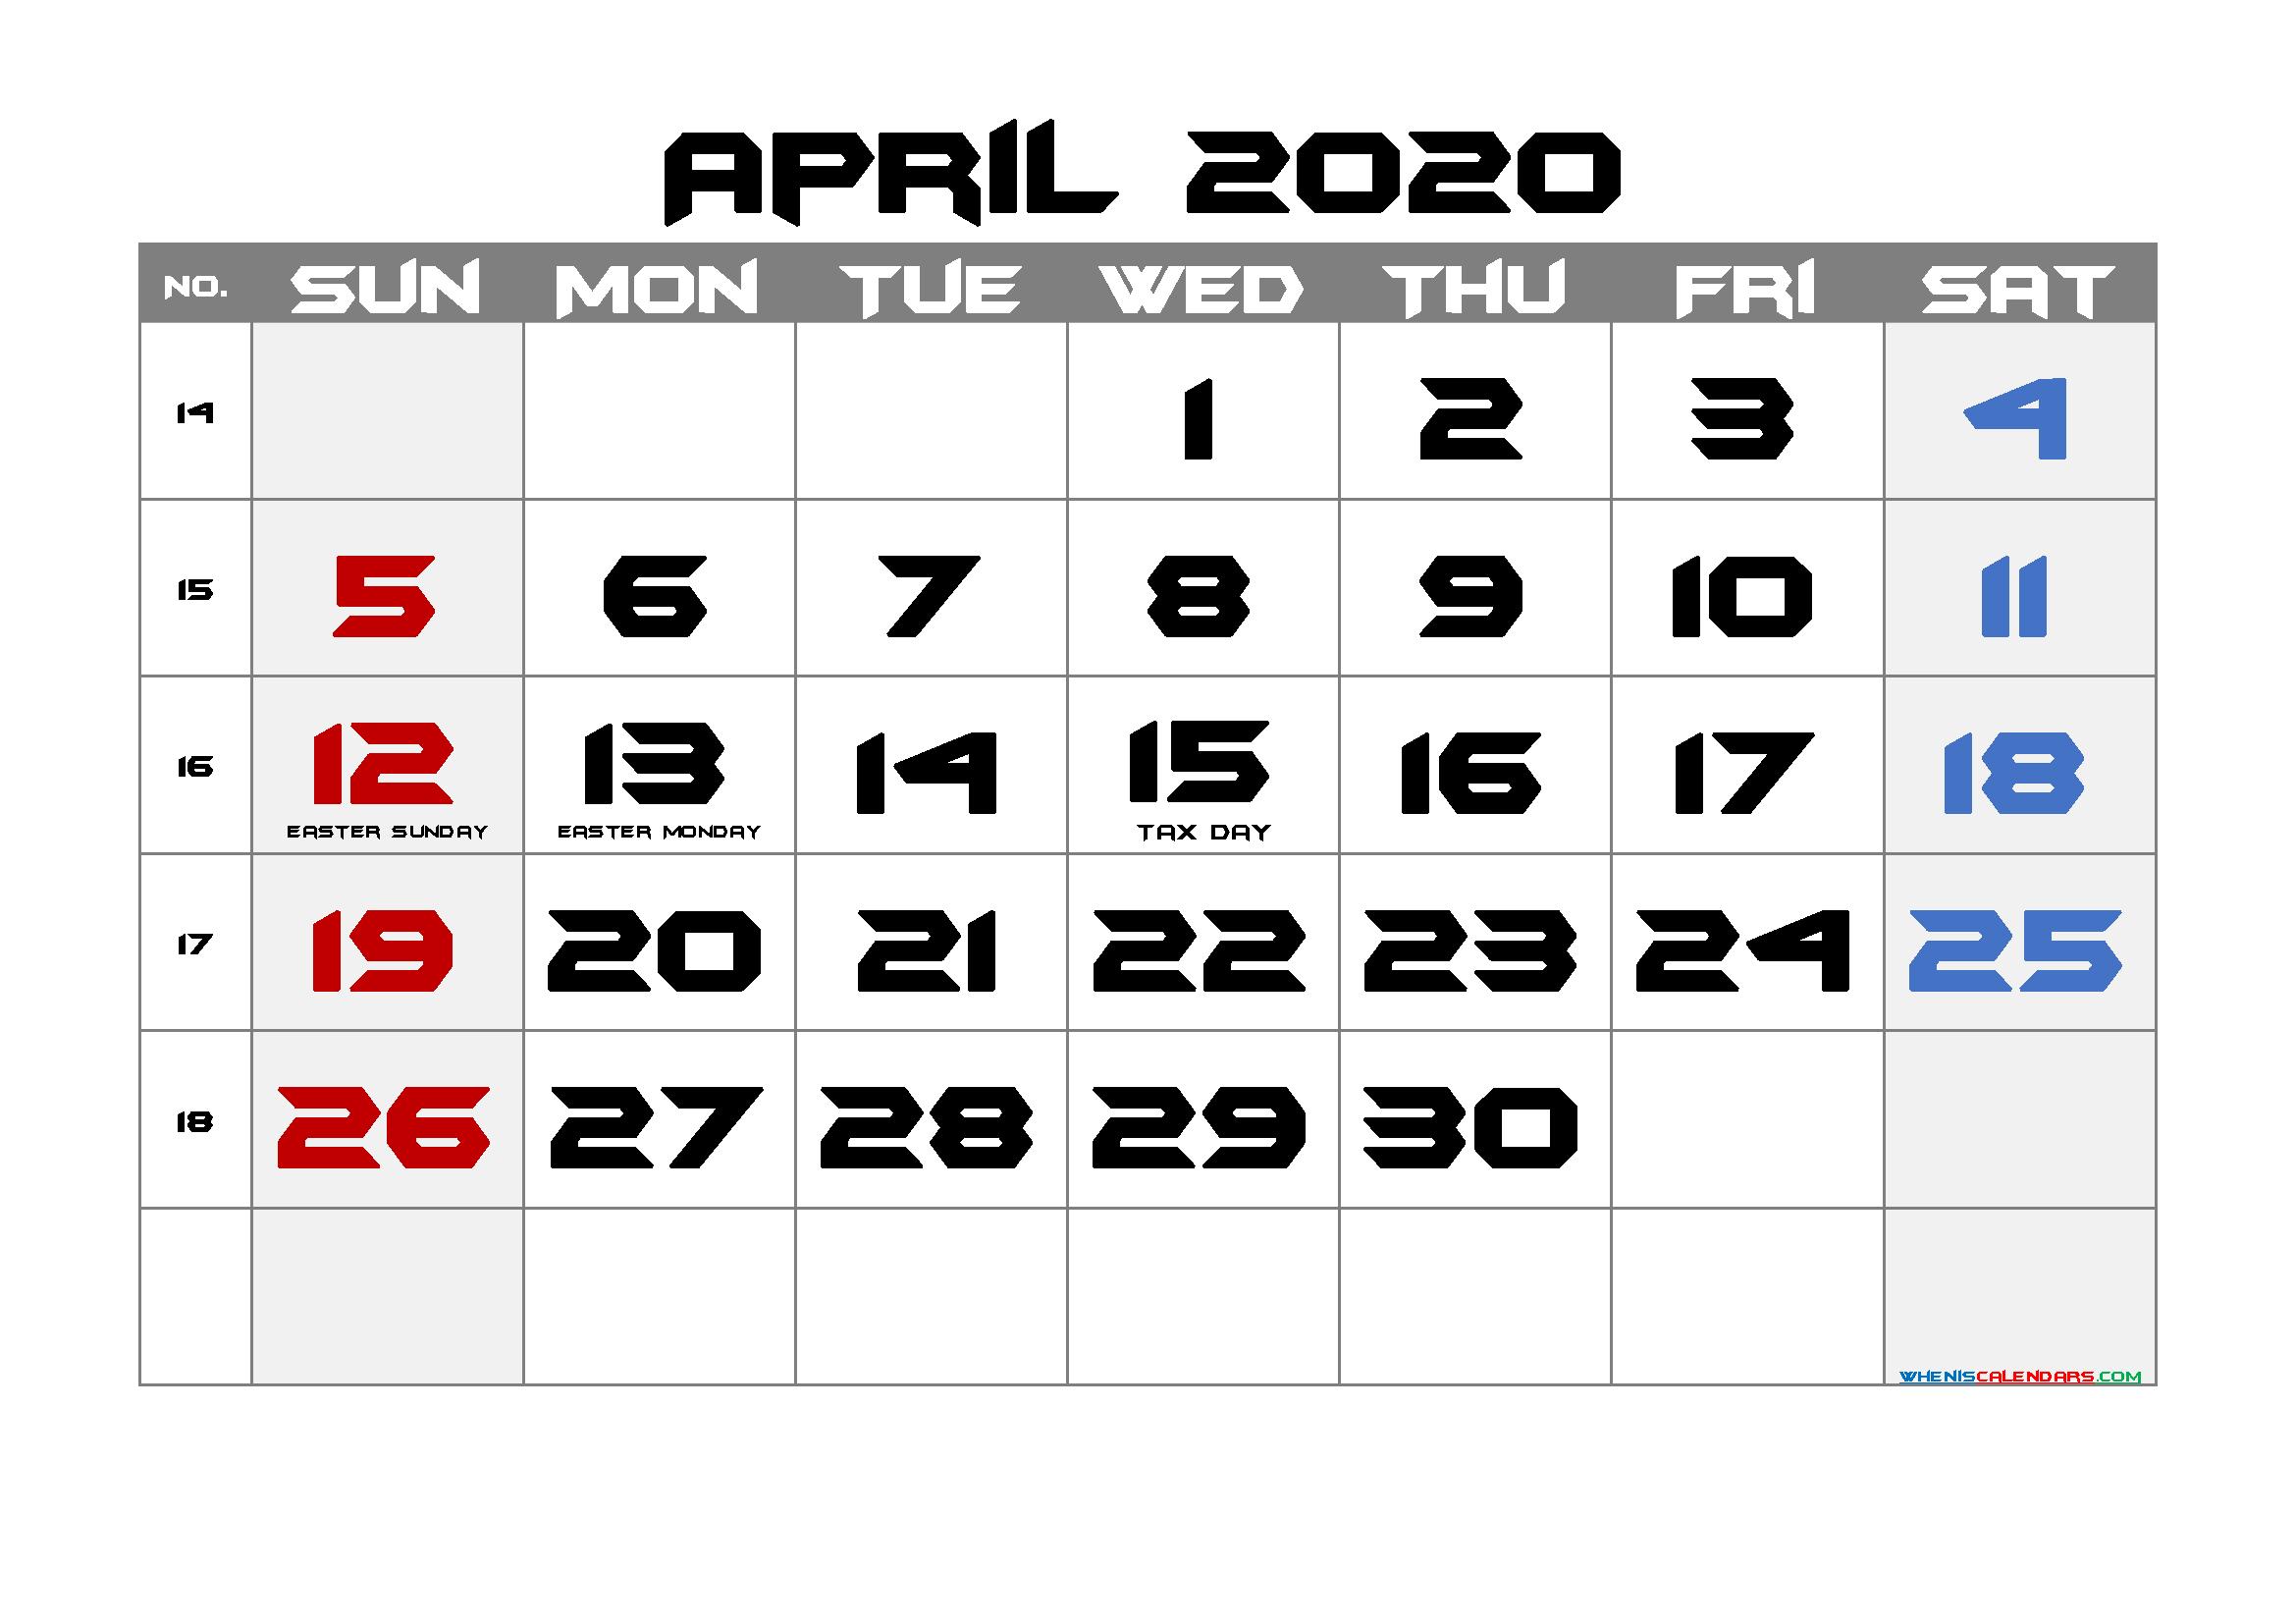 Printable APRIL 2020 Calendar with Holidays